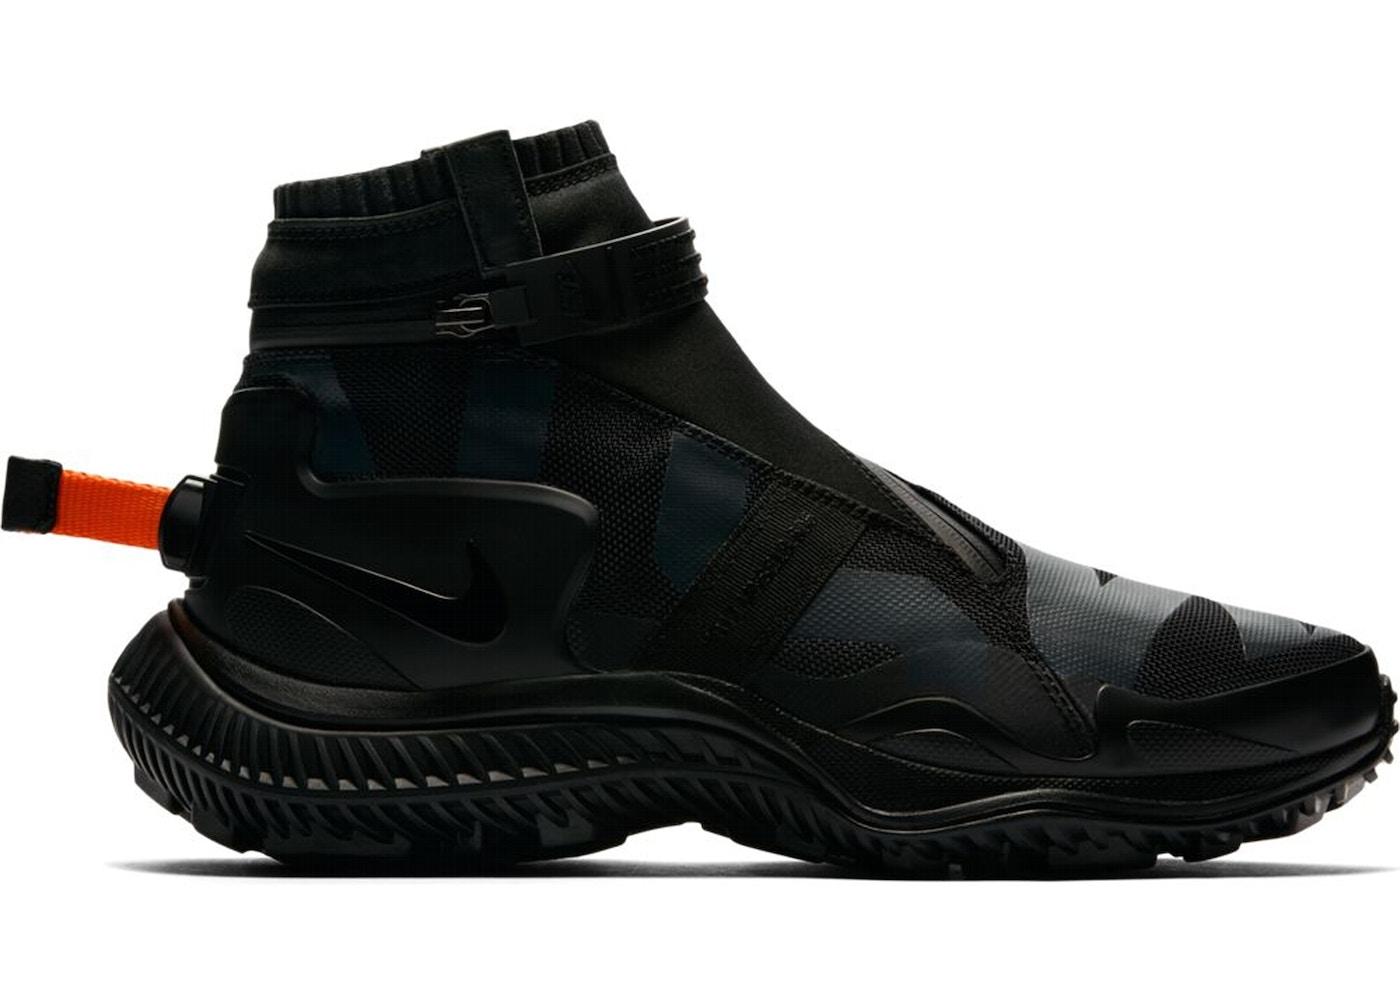 28e27271d3c Nike NSW Gaiter Boot Black Anthracite